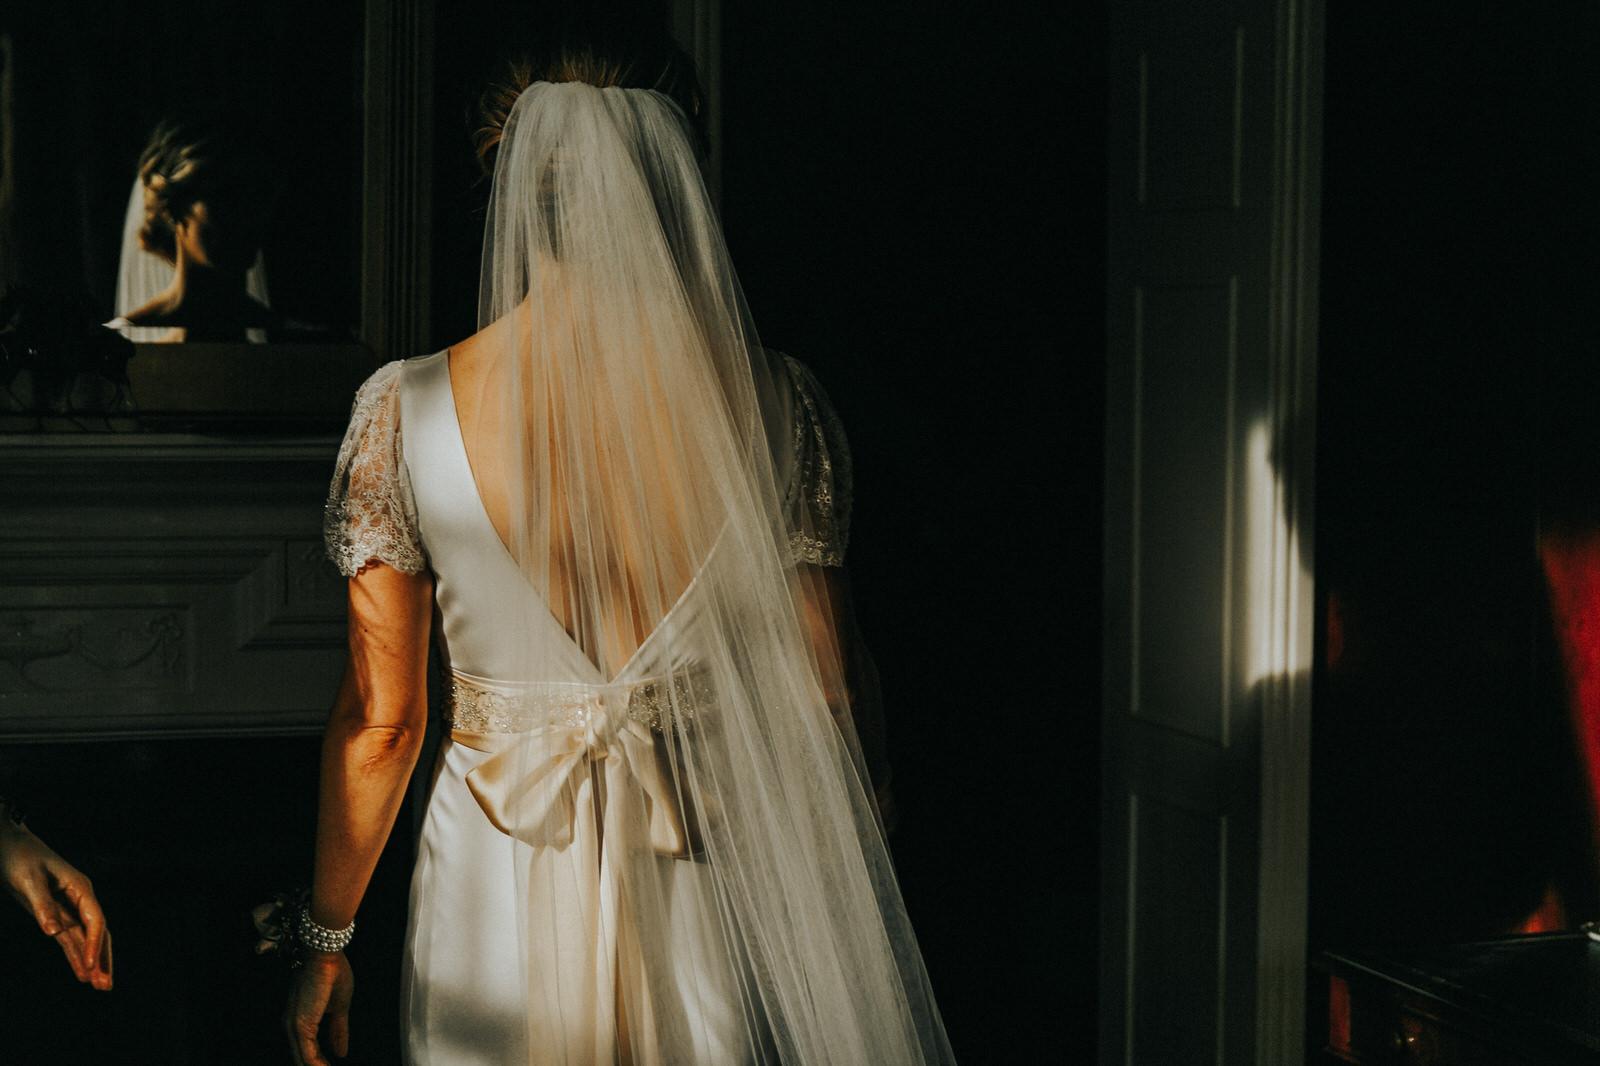 Dunbrody_House_Wedding_photographer_047.jpg